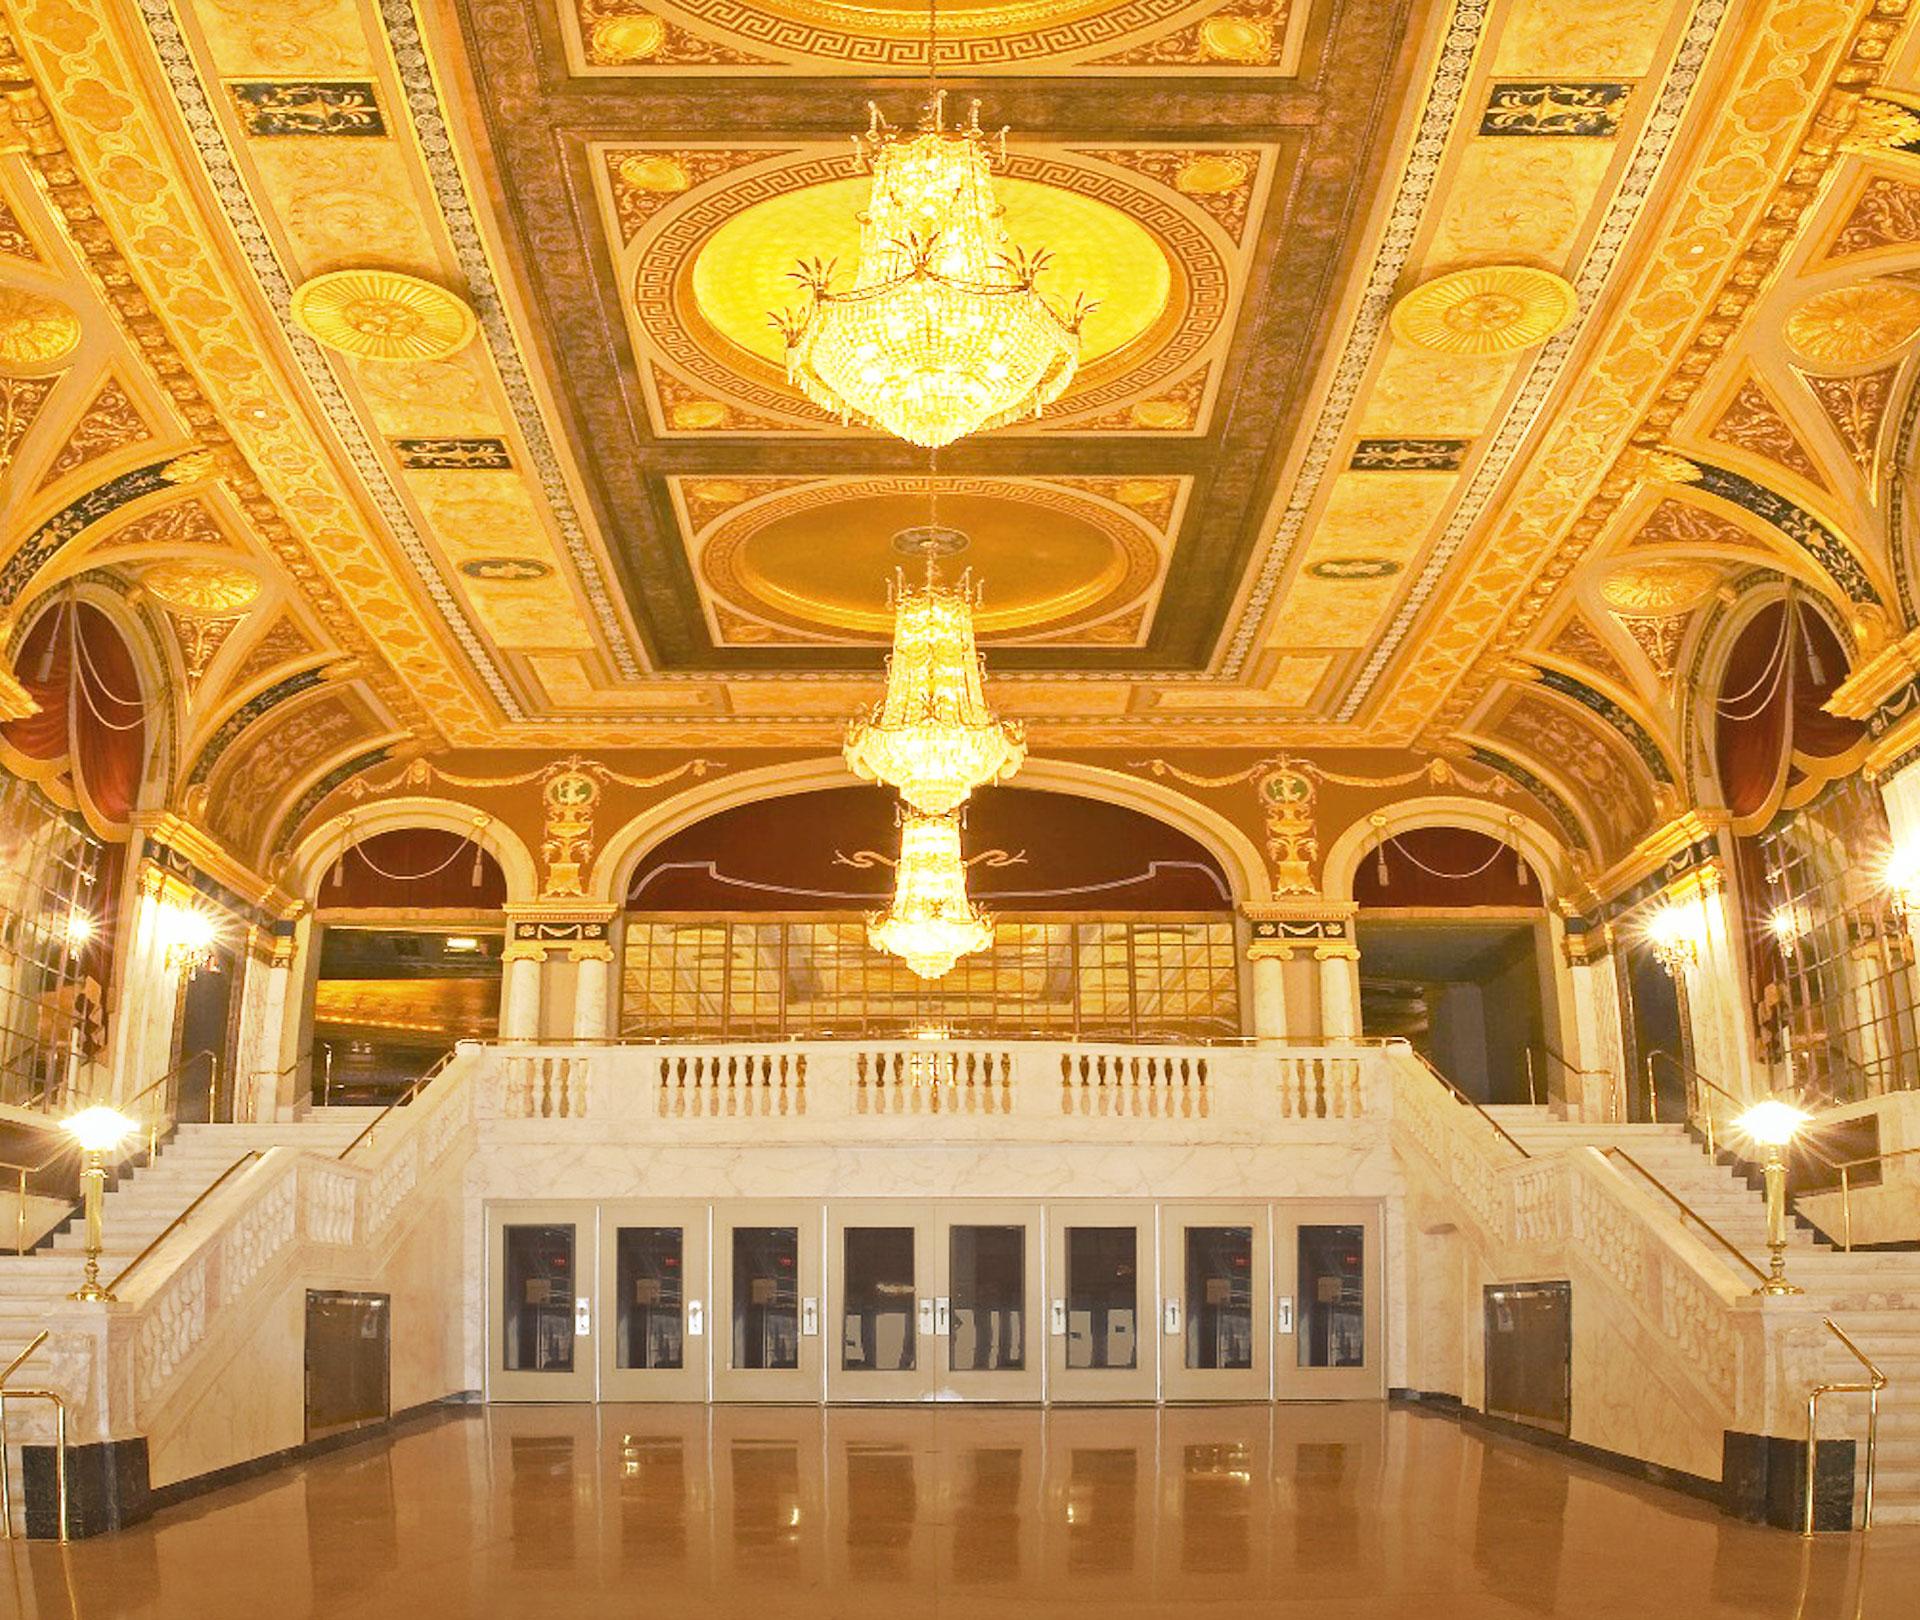 Seating Chart of The Palace Theater, Mezzanine & Balcony ...